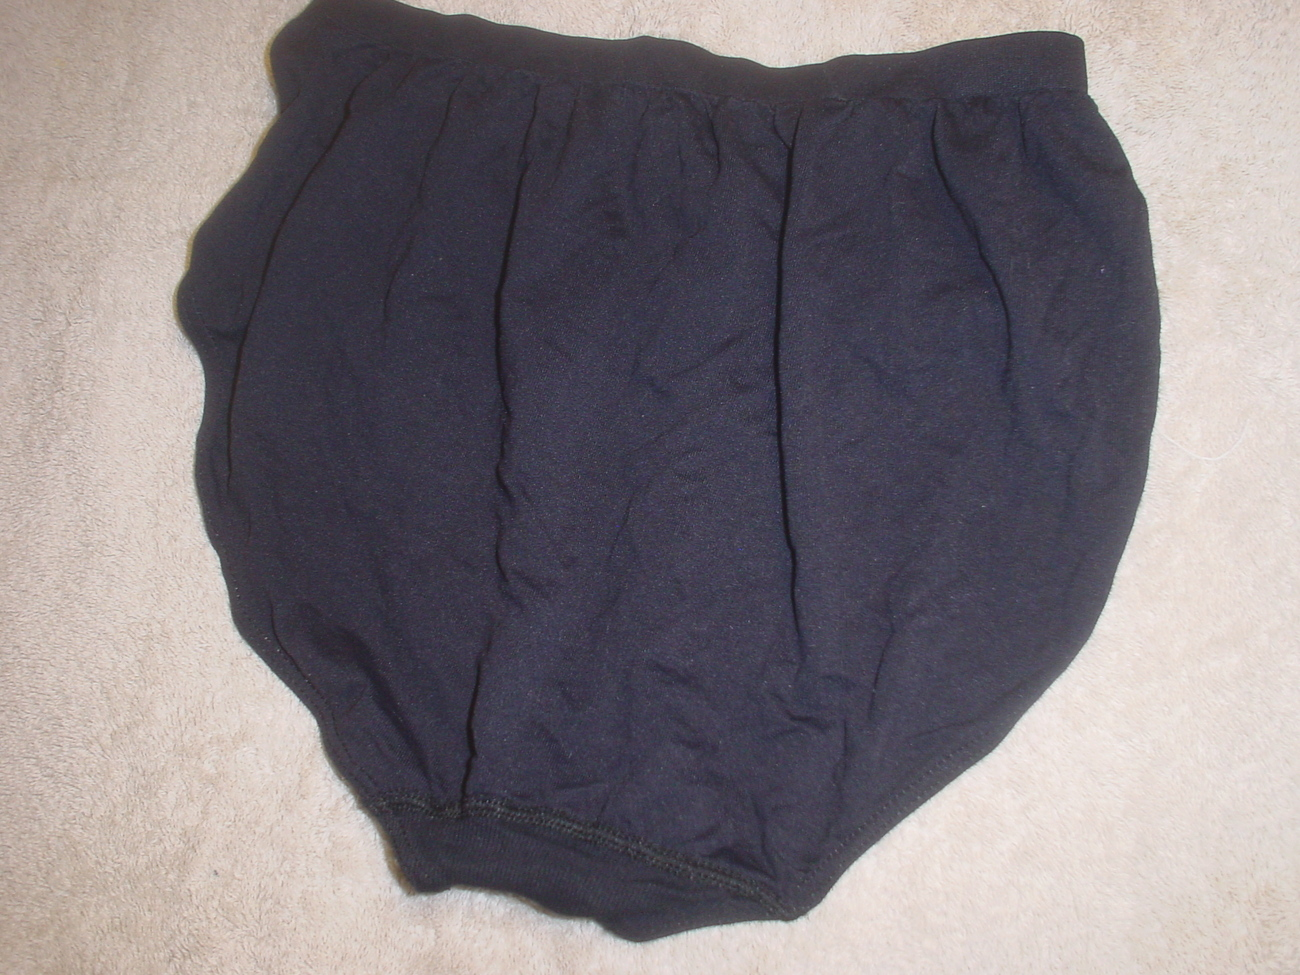 Jockey Seamfree Panty 7/Large Black SP-Slightly Imperfect NWOT